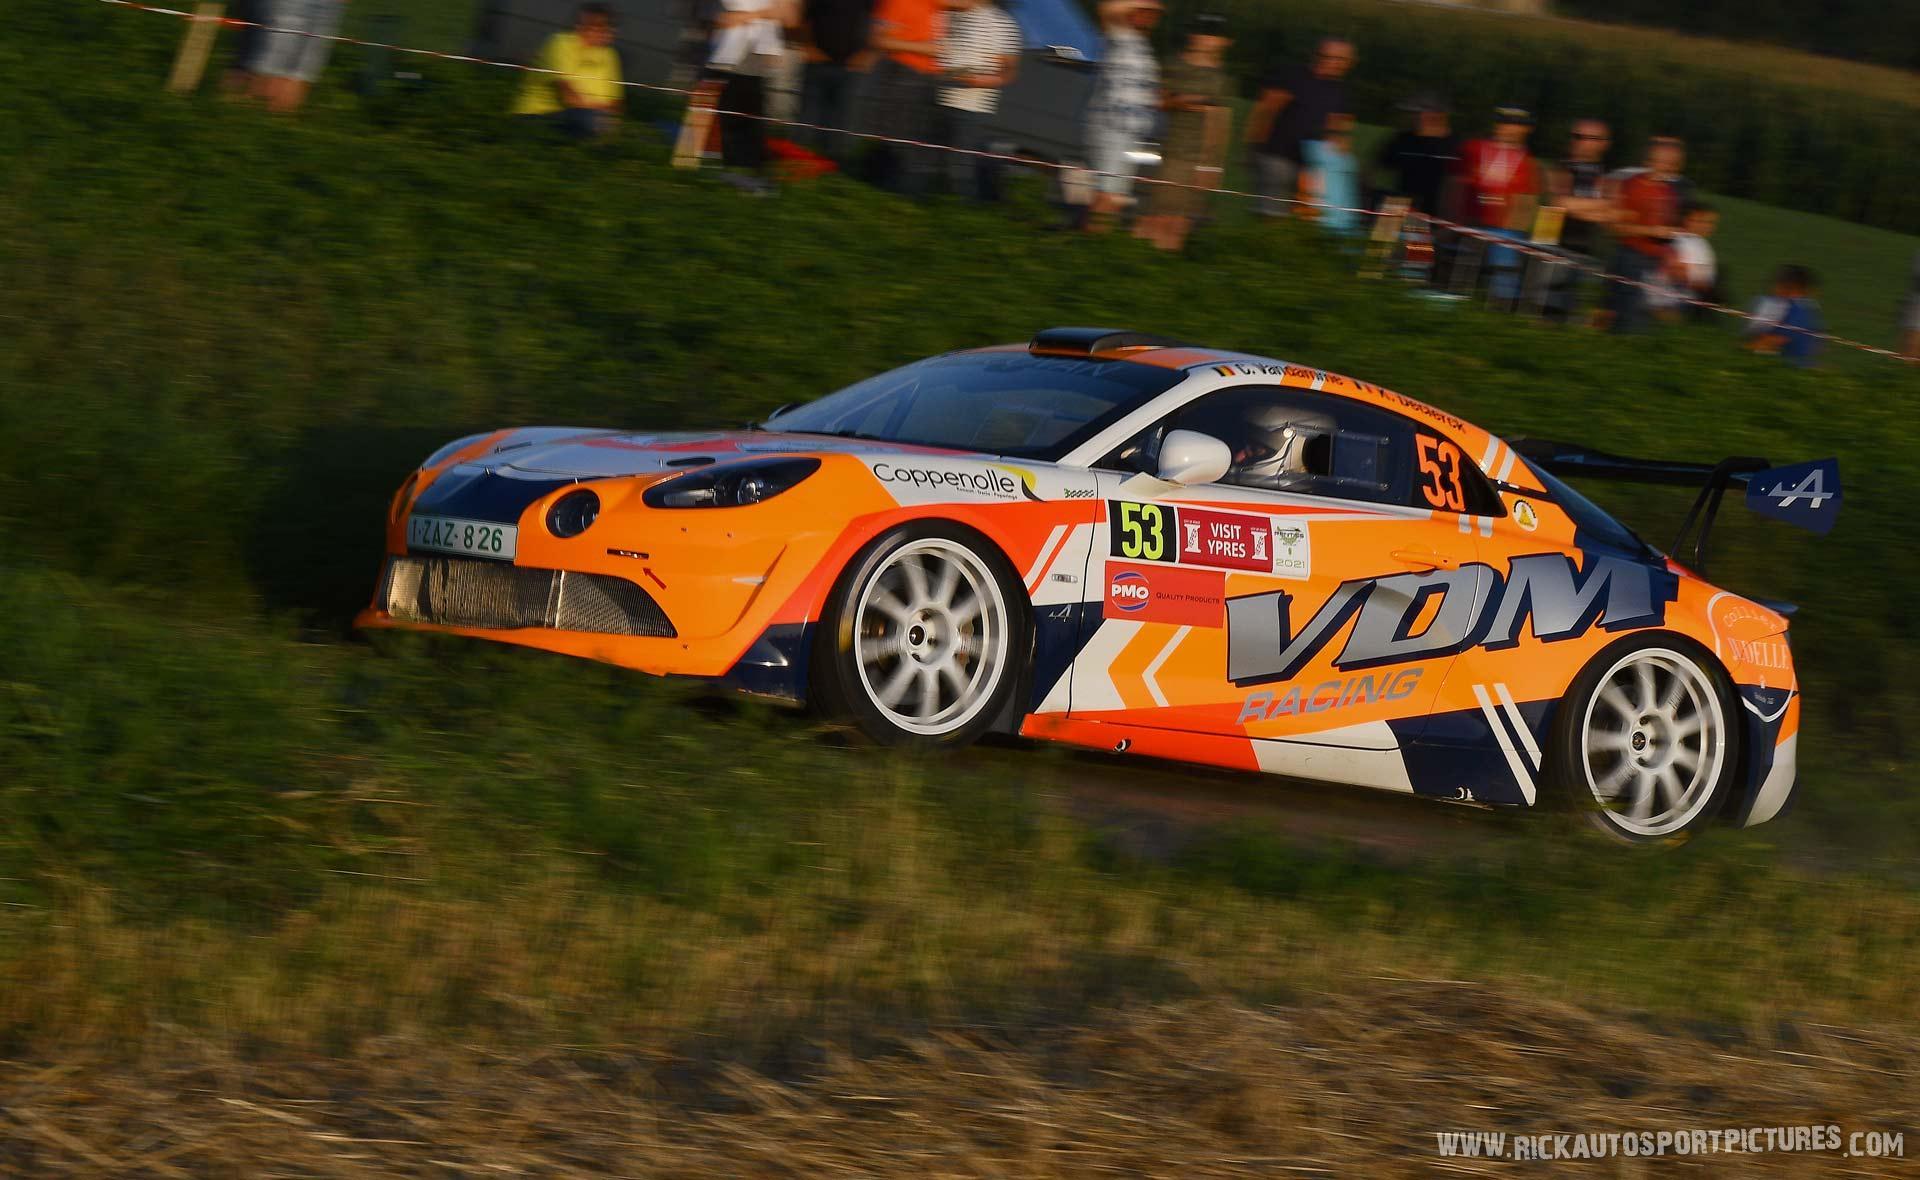 Chris vandamme alpine A110 rally ypres 2021